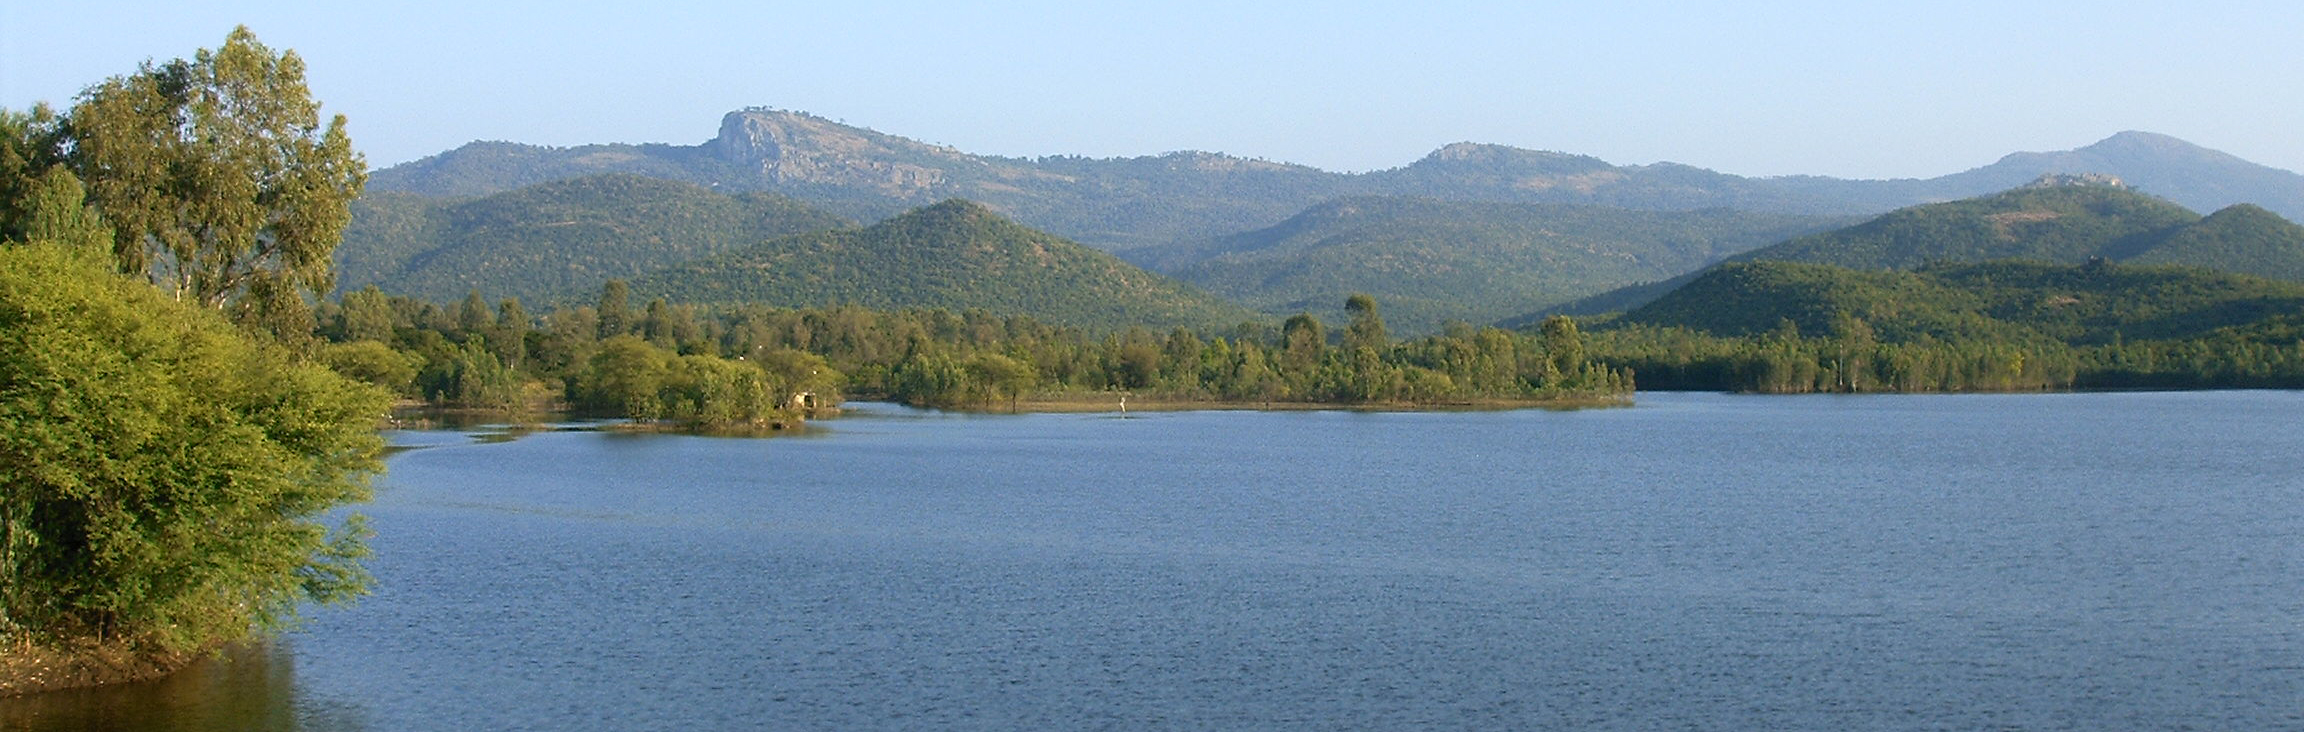 BR hills or Biligiriranga Hills